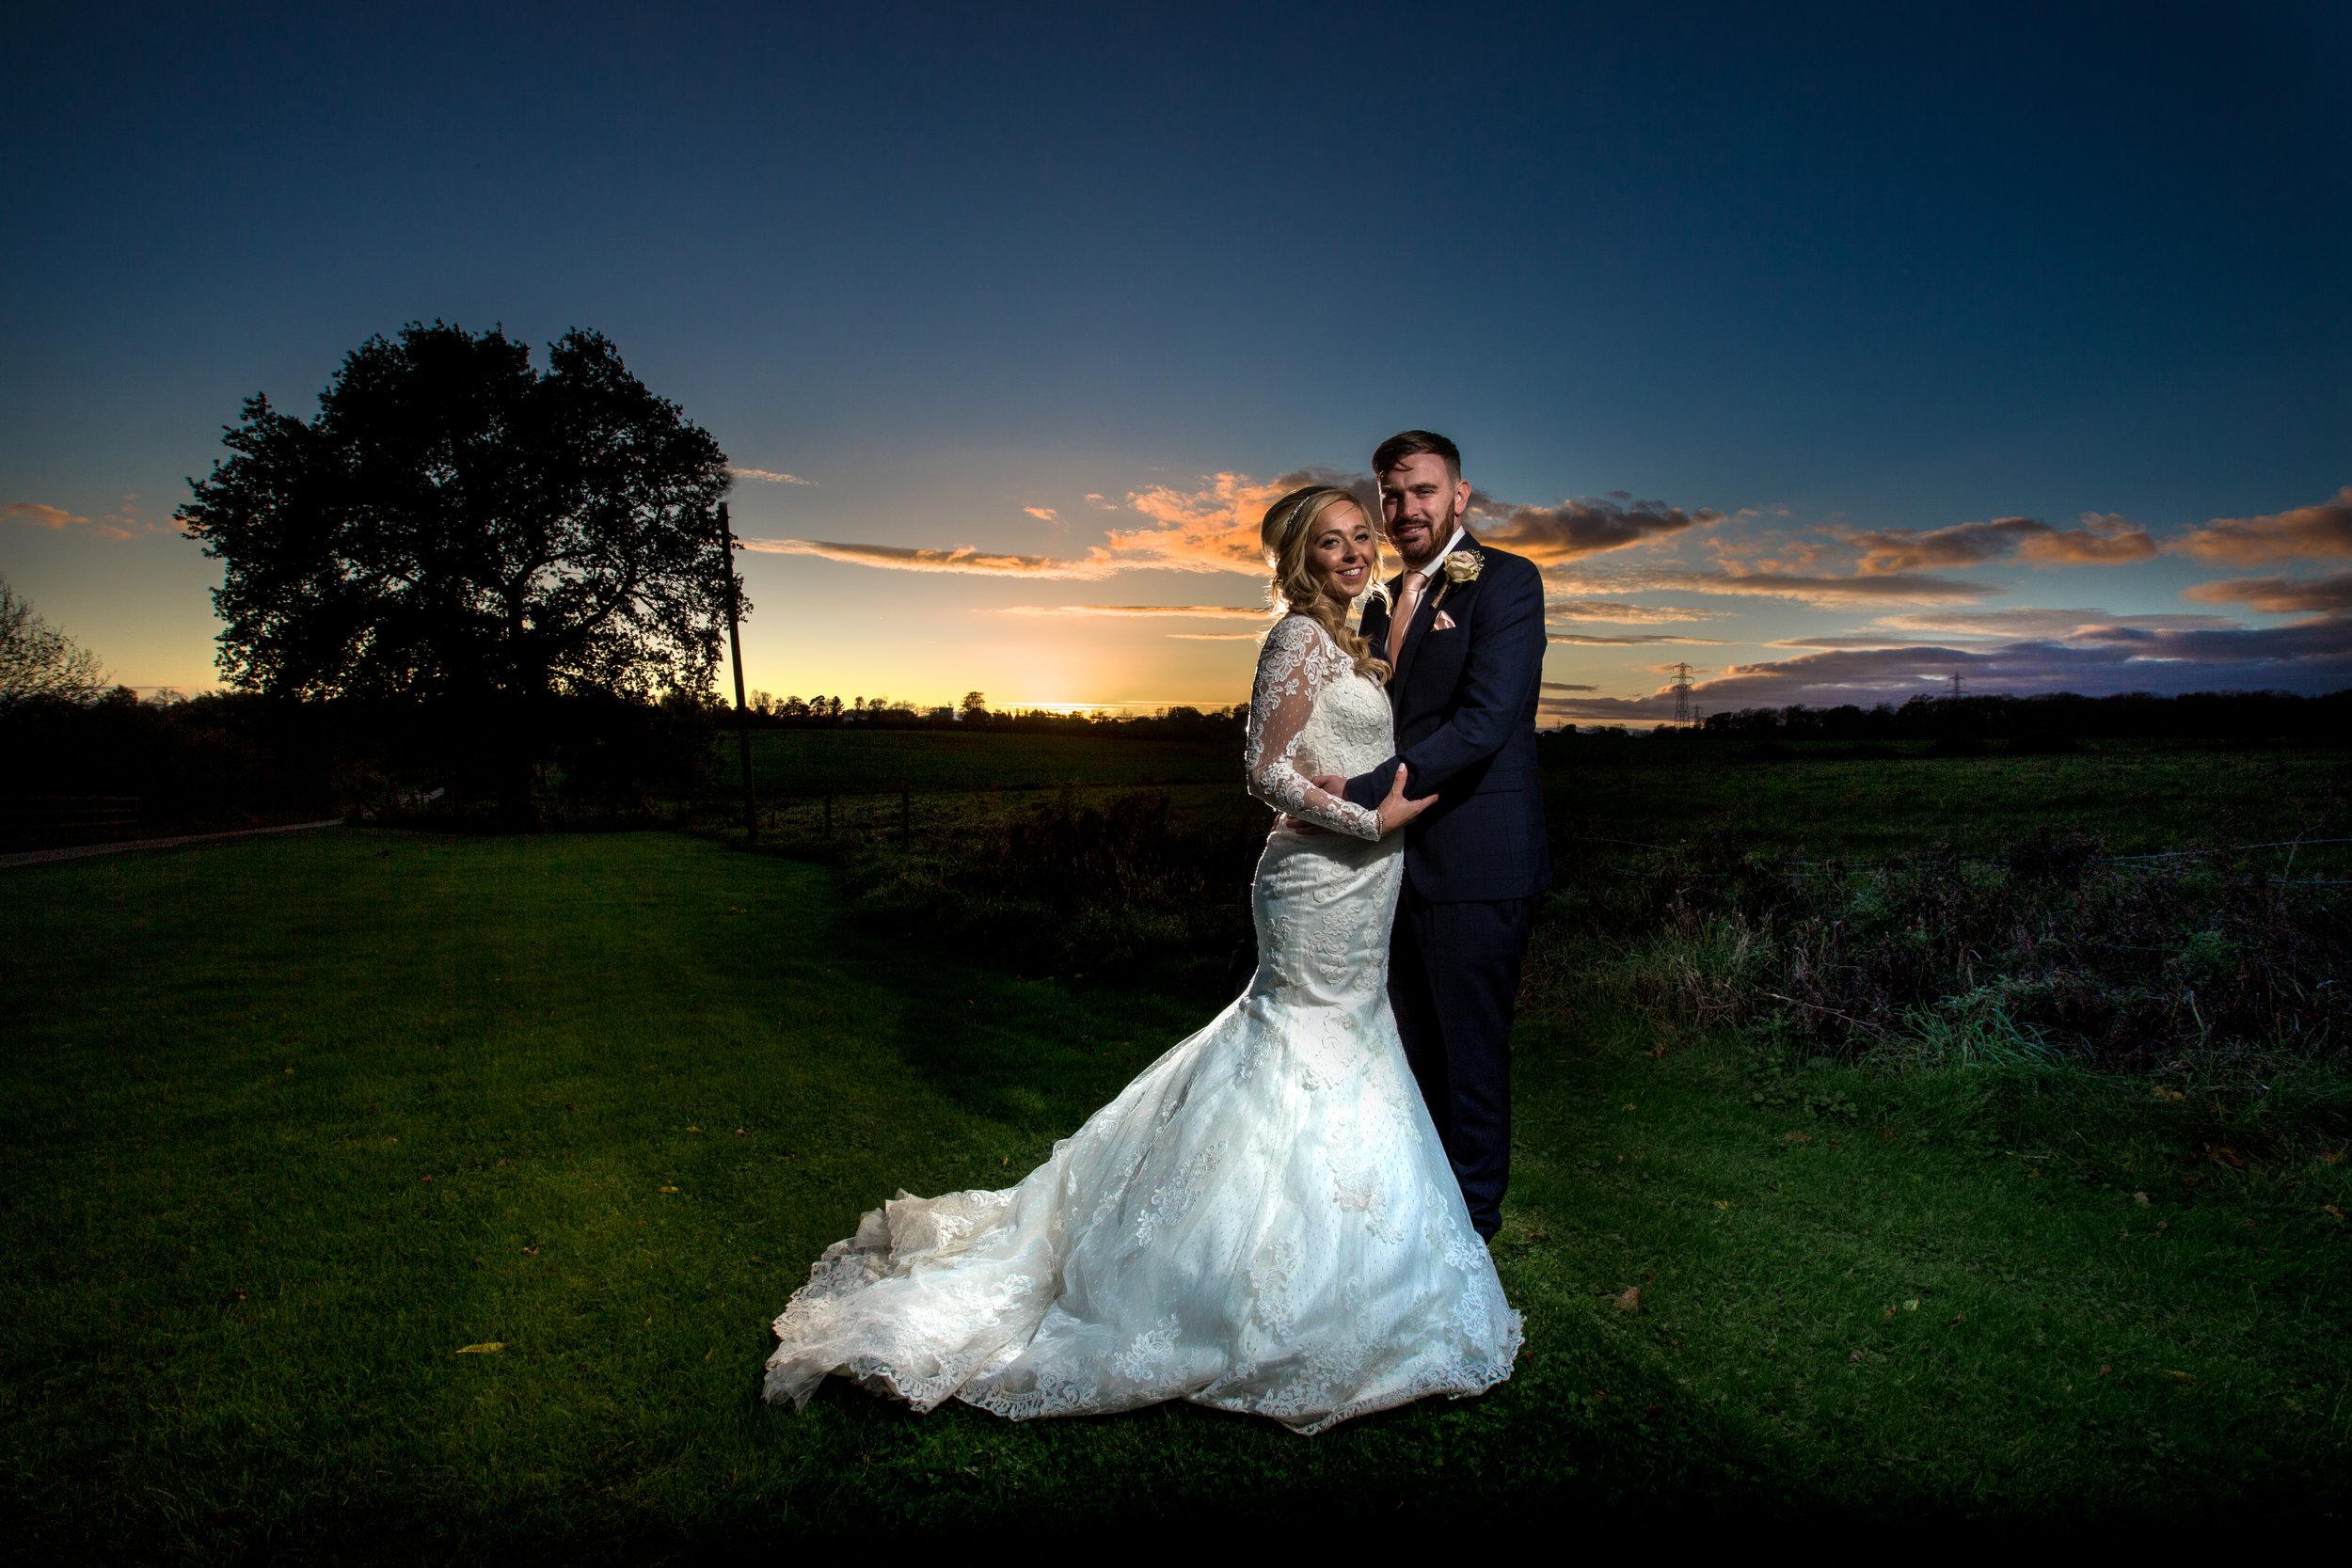 london-hertfordshire-wedding-photography-milling-barn-portrait-sunset-601